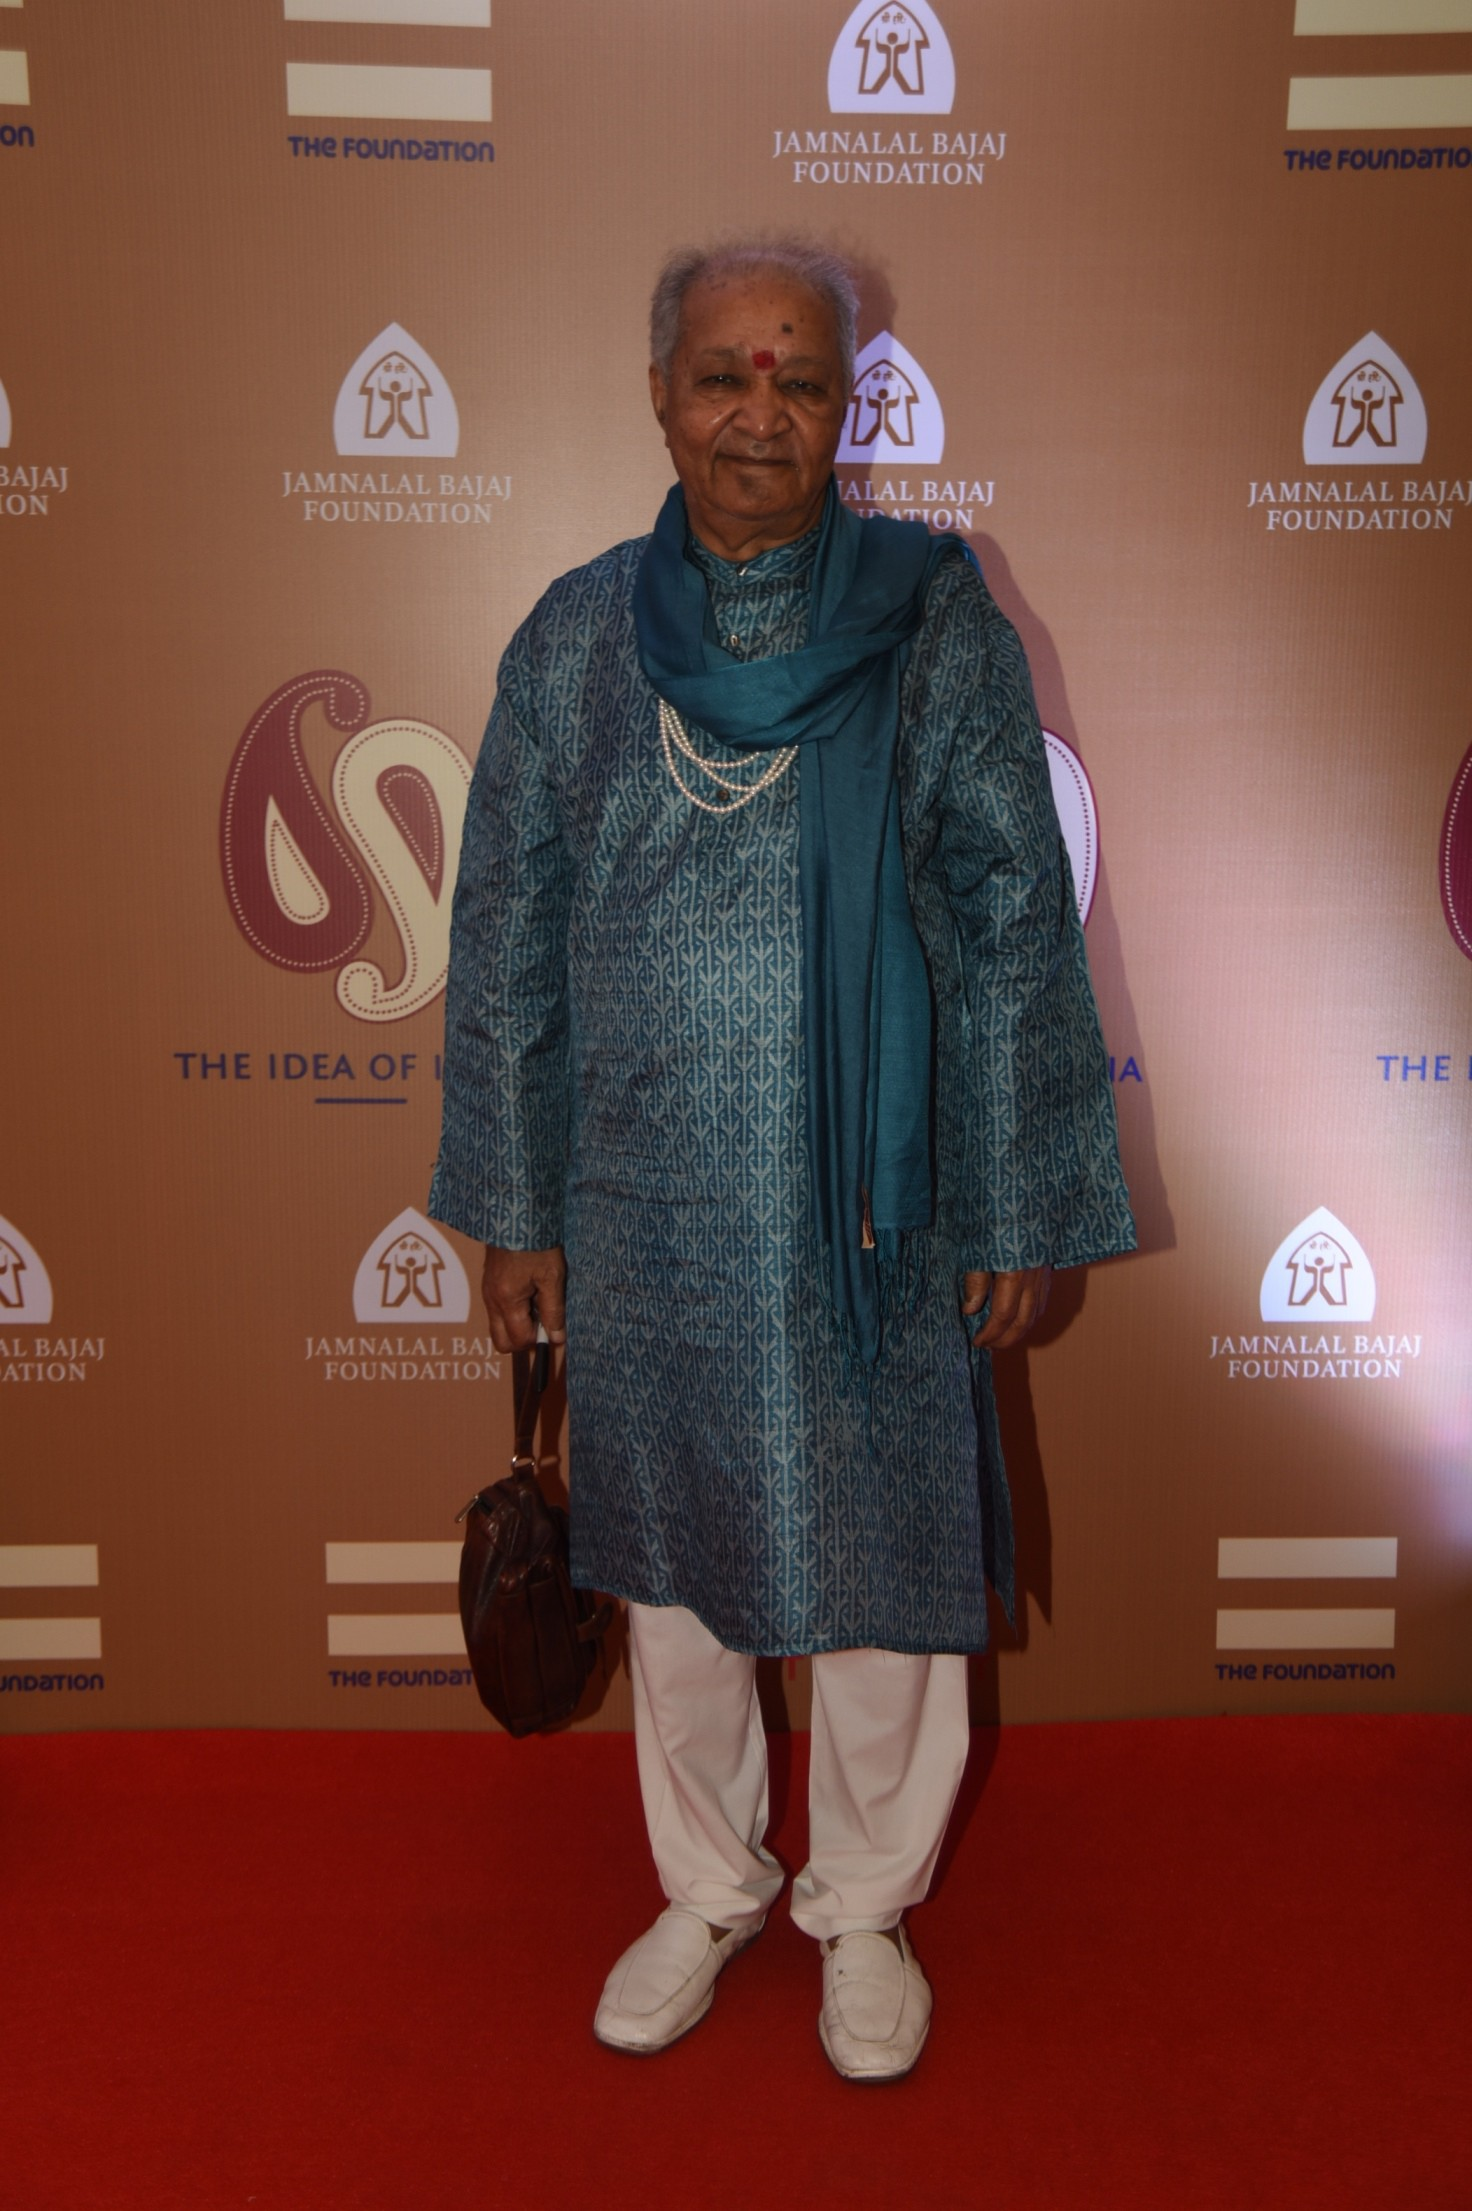 Pandit Hariprasad Chaurasiya